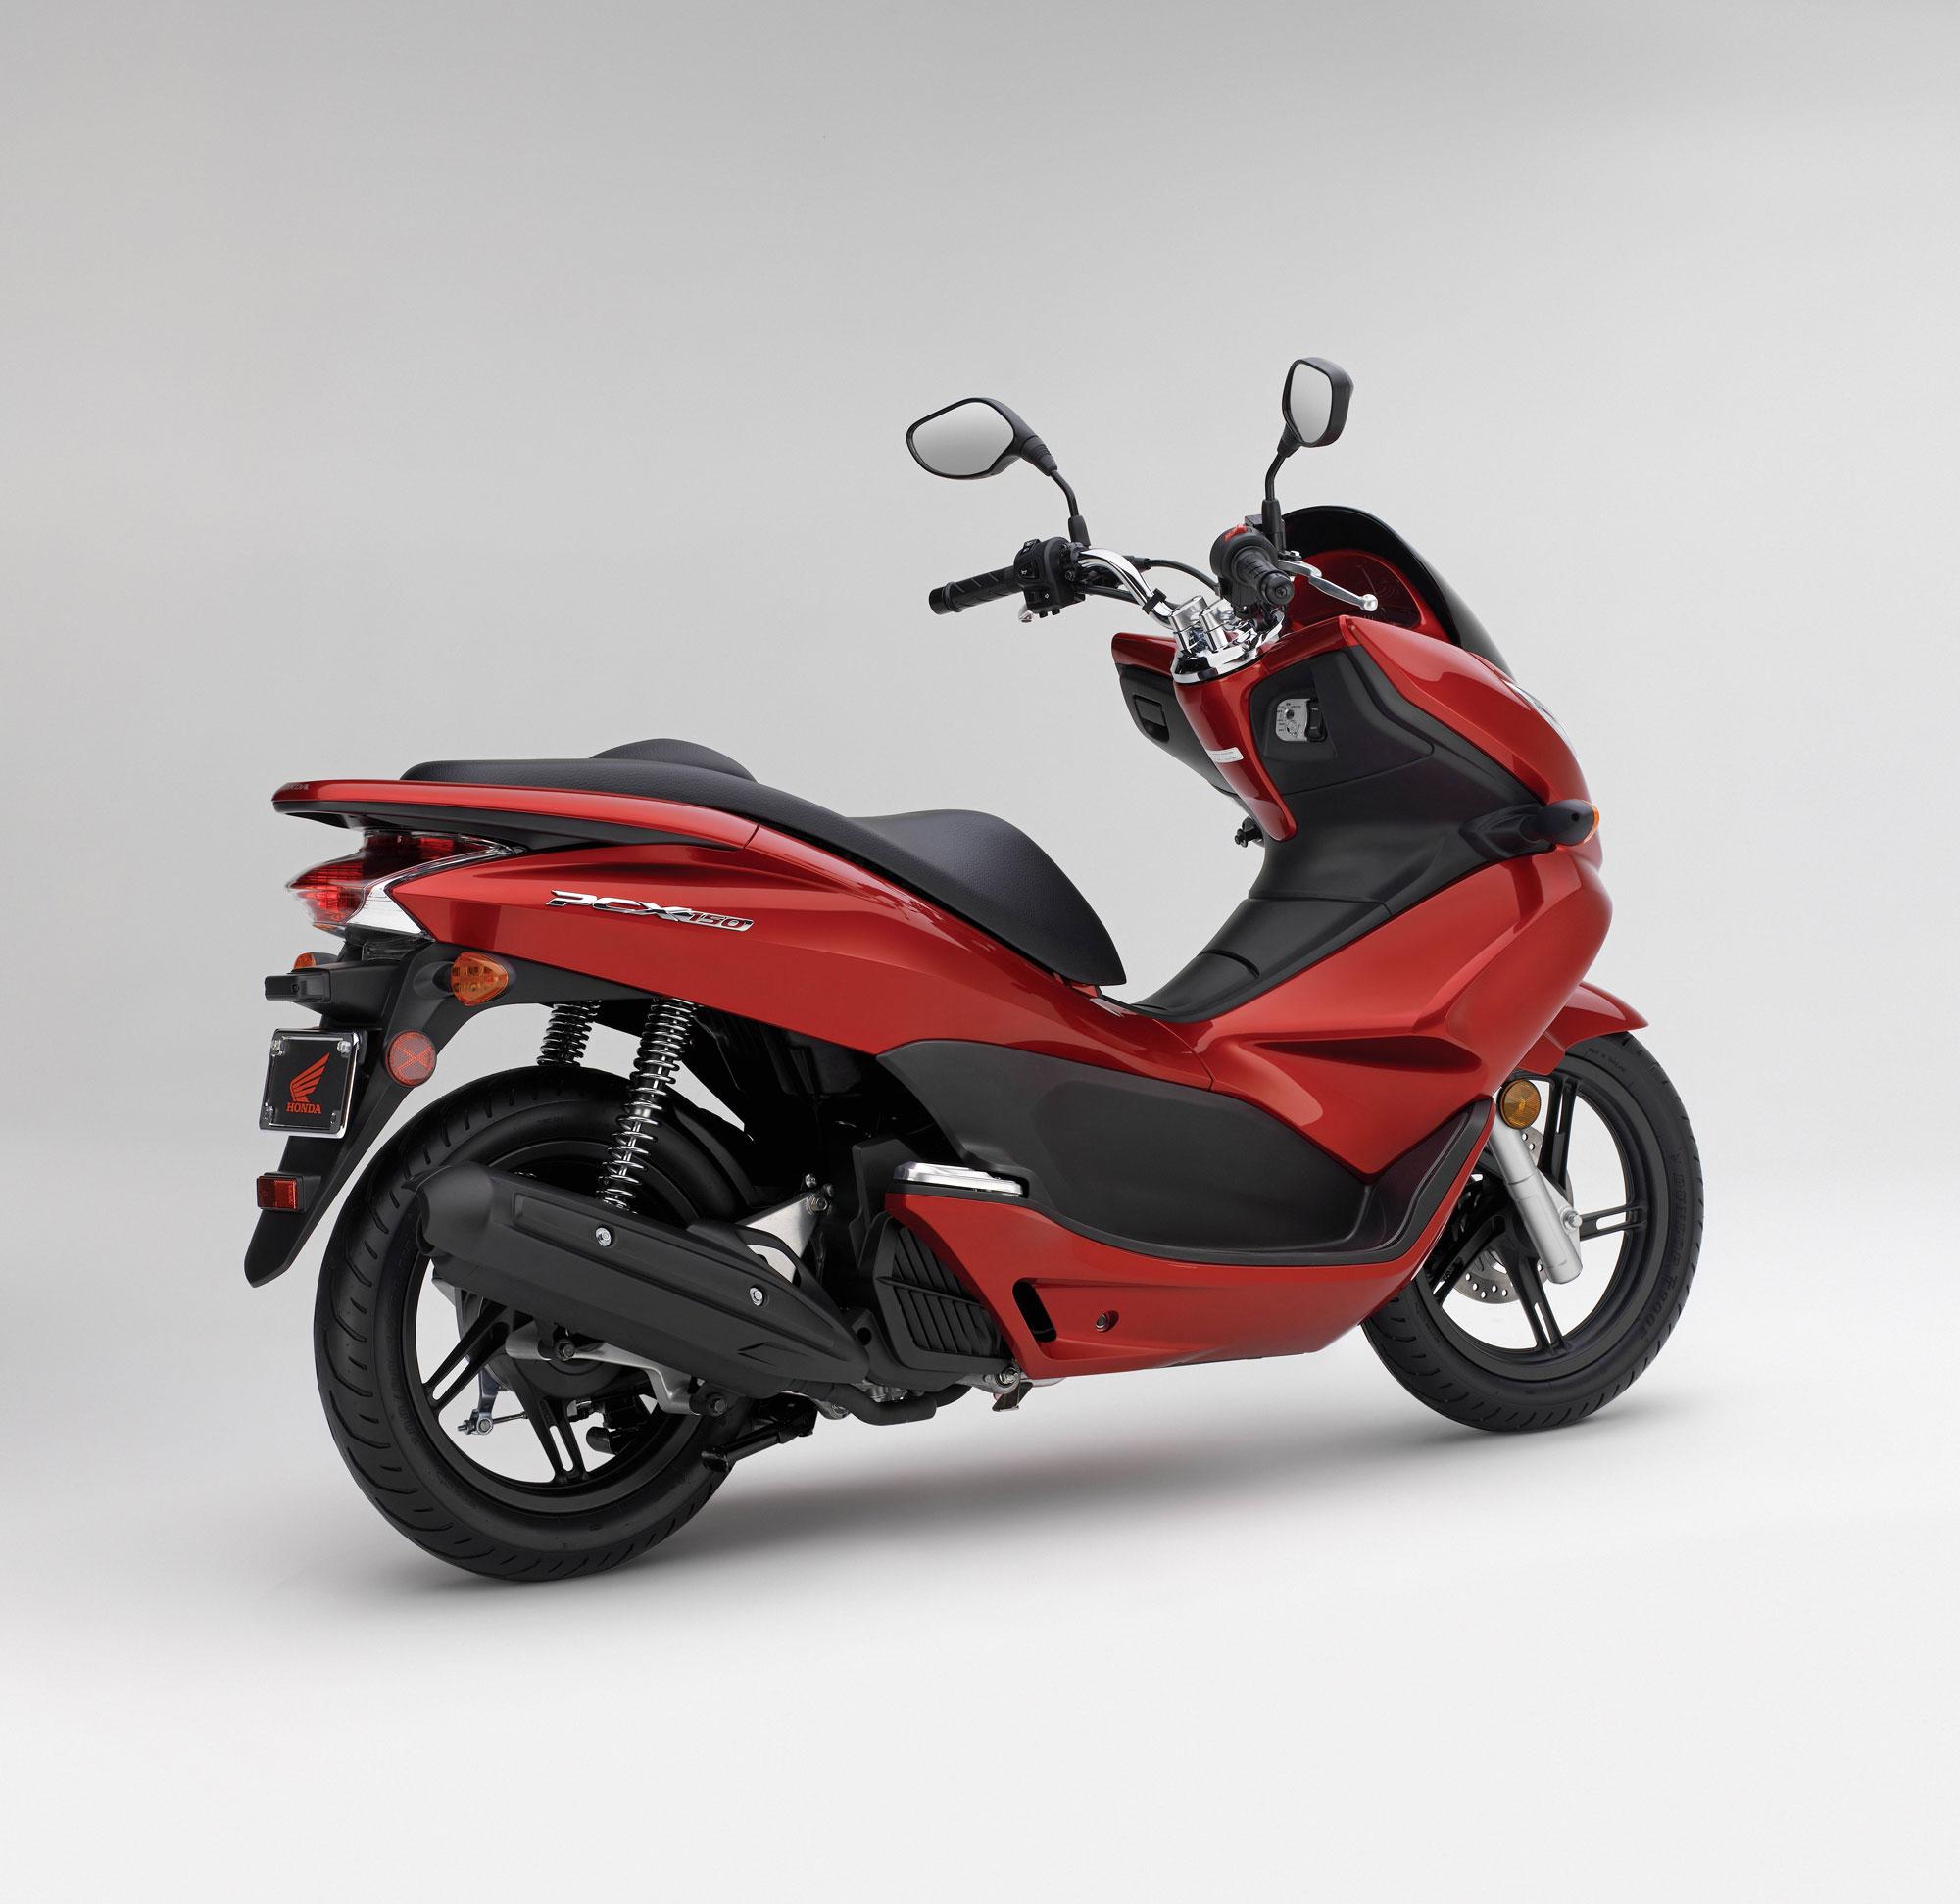 walkaround honda scooter milan pcx eicma watch